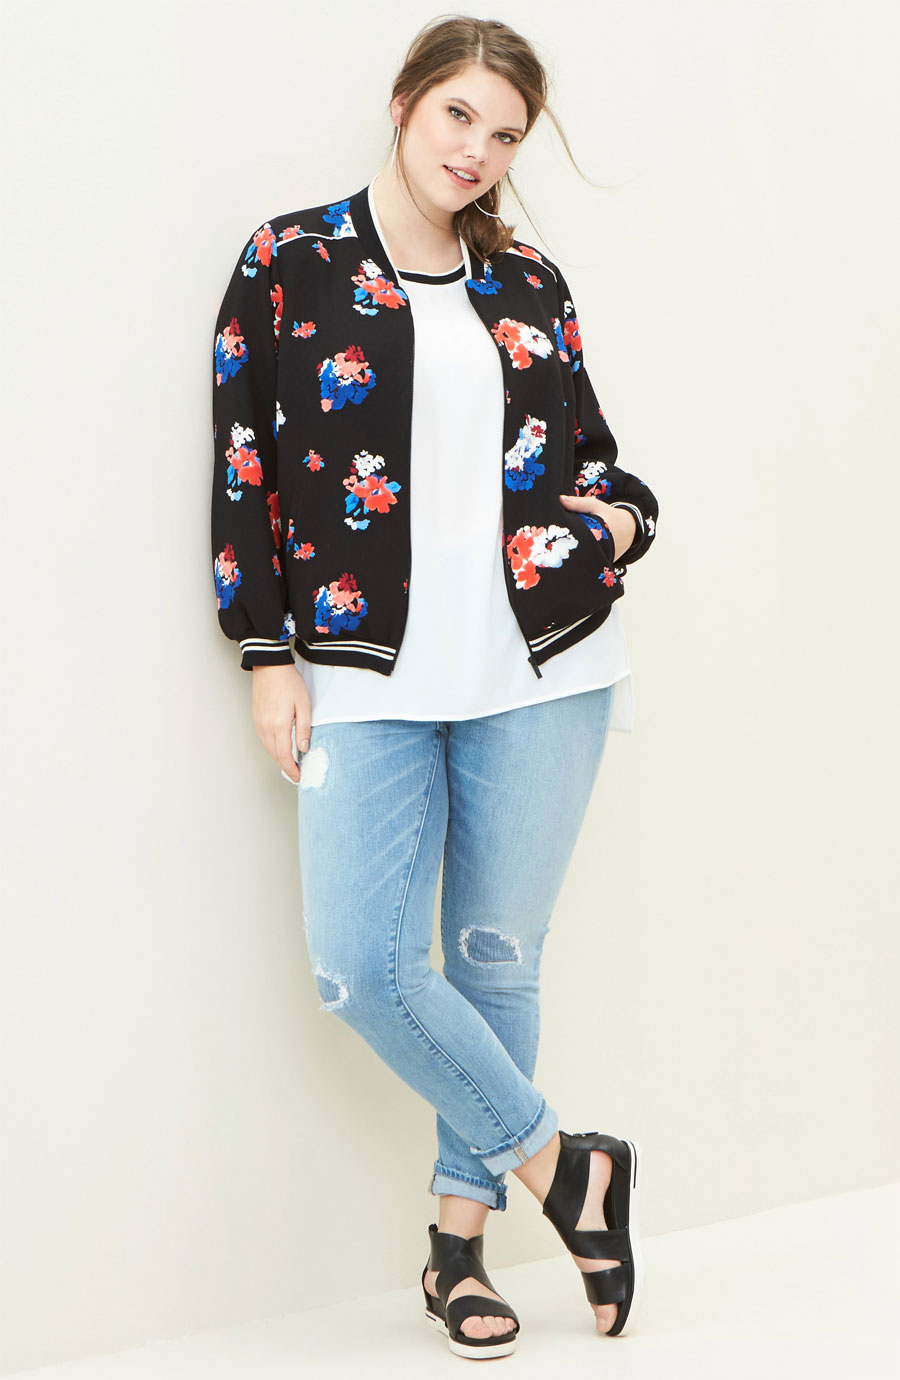 Vince Camuto Floral Print Bomber Jacket